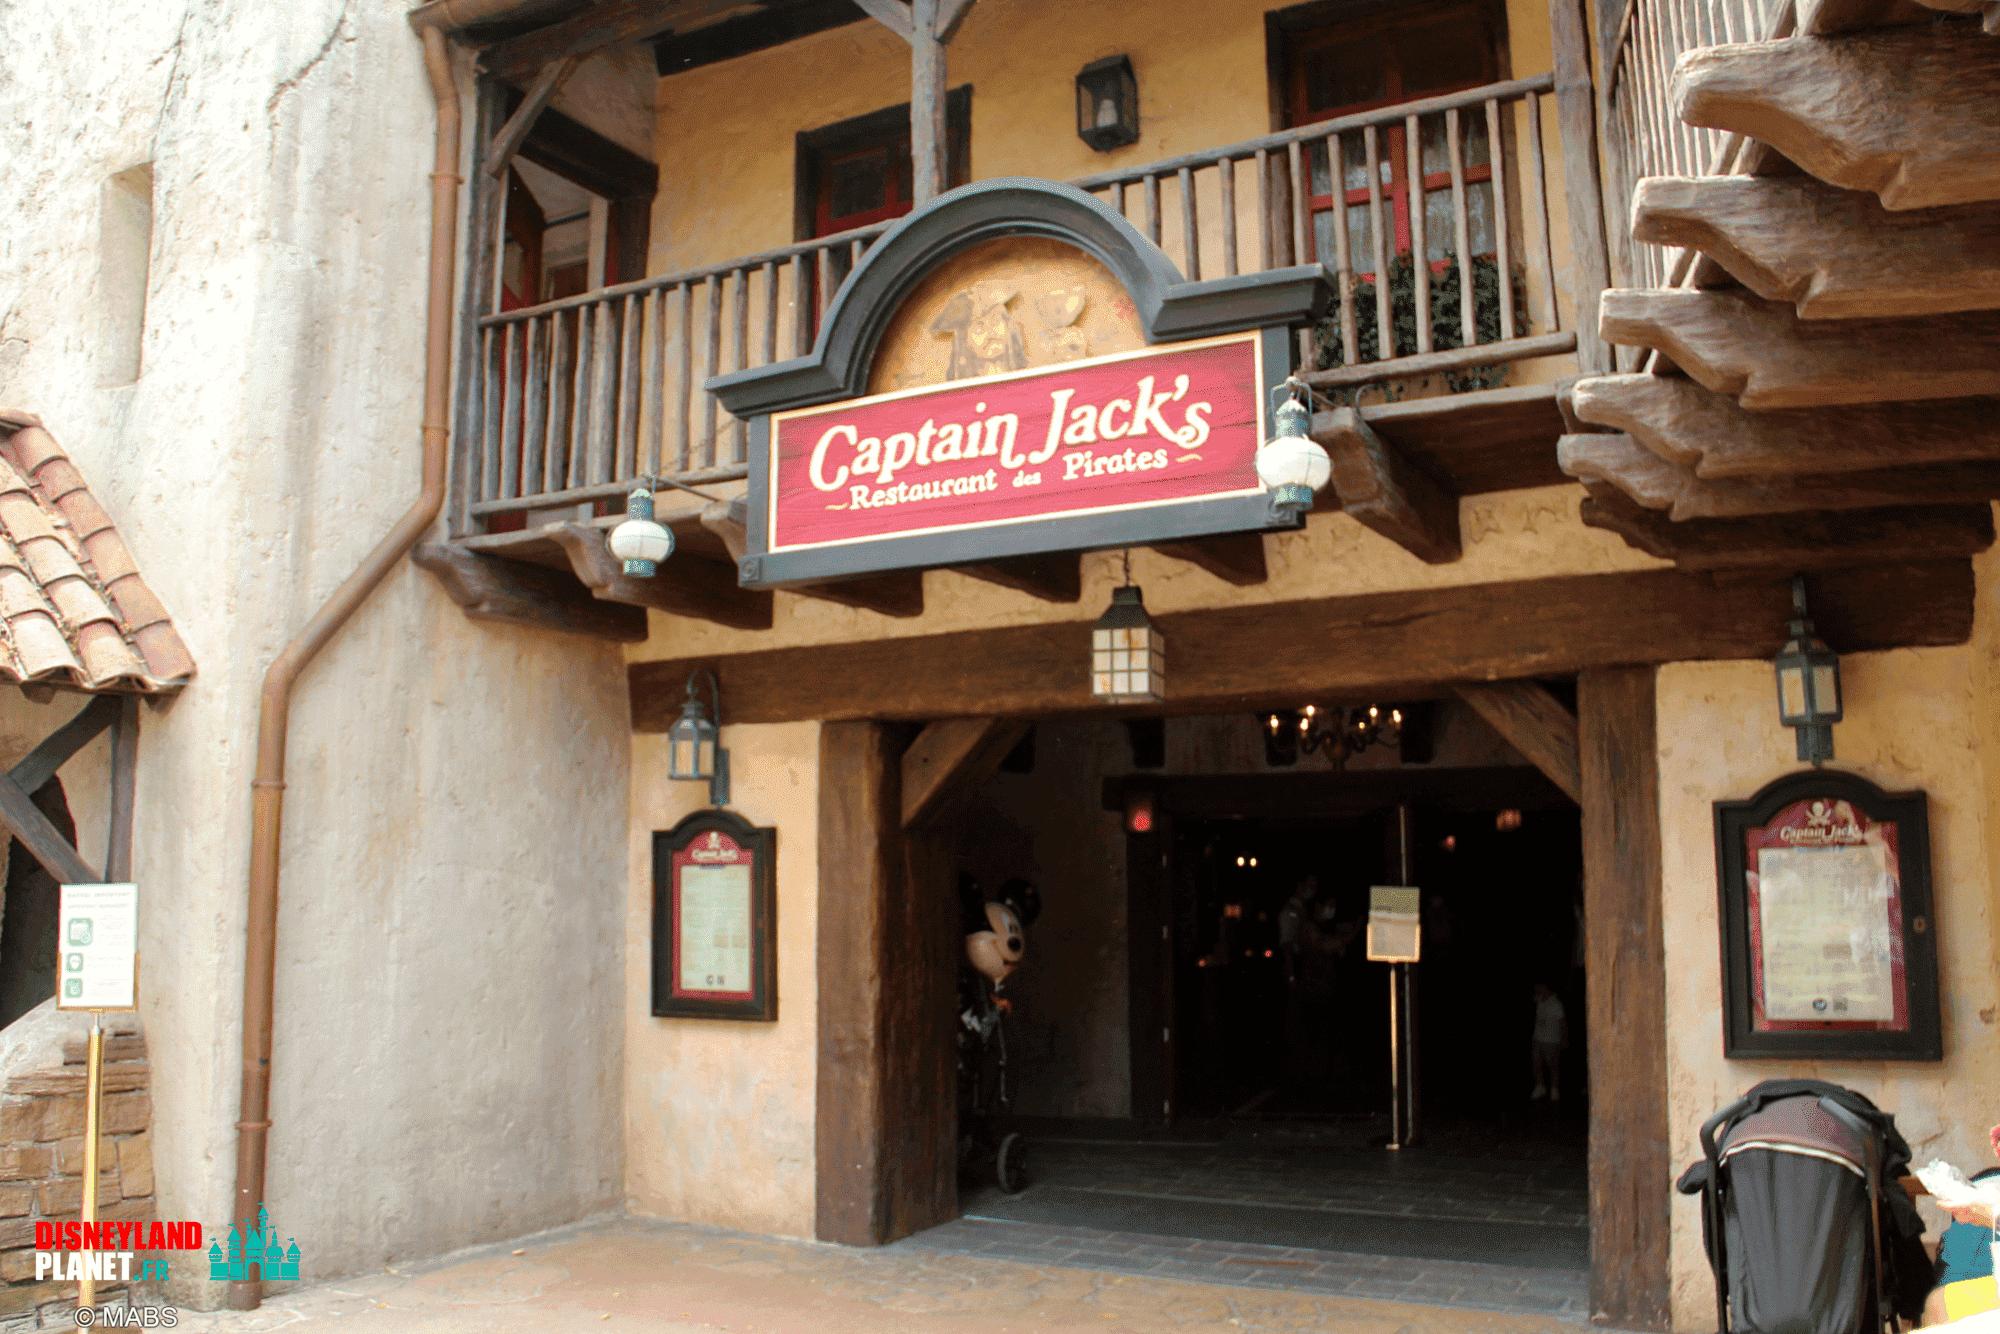 captain jacks restaurant pirates disneyland paris